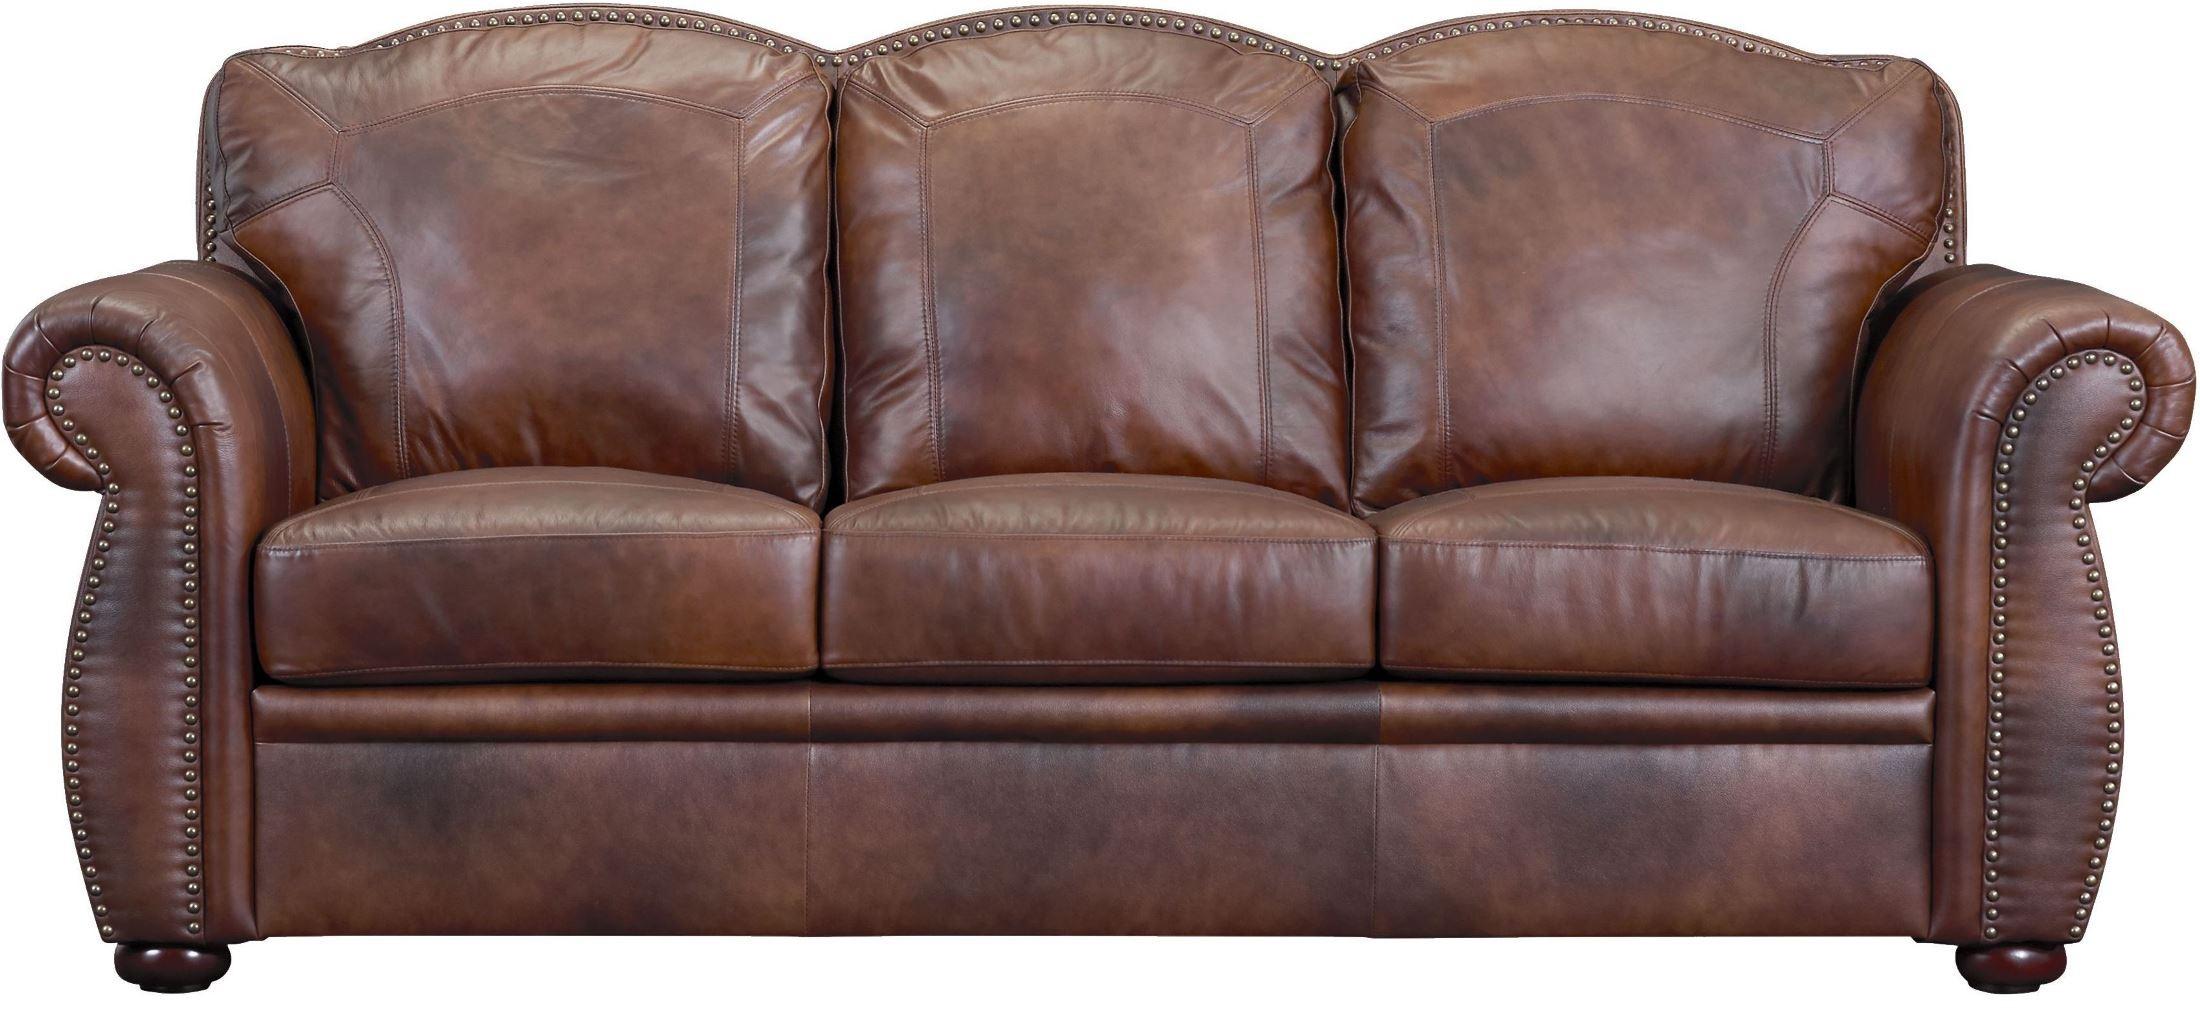 Arizona Marco Living Room Set from Leather Italia (1444 ...